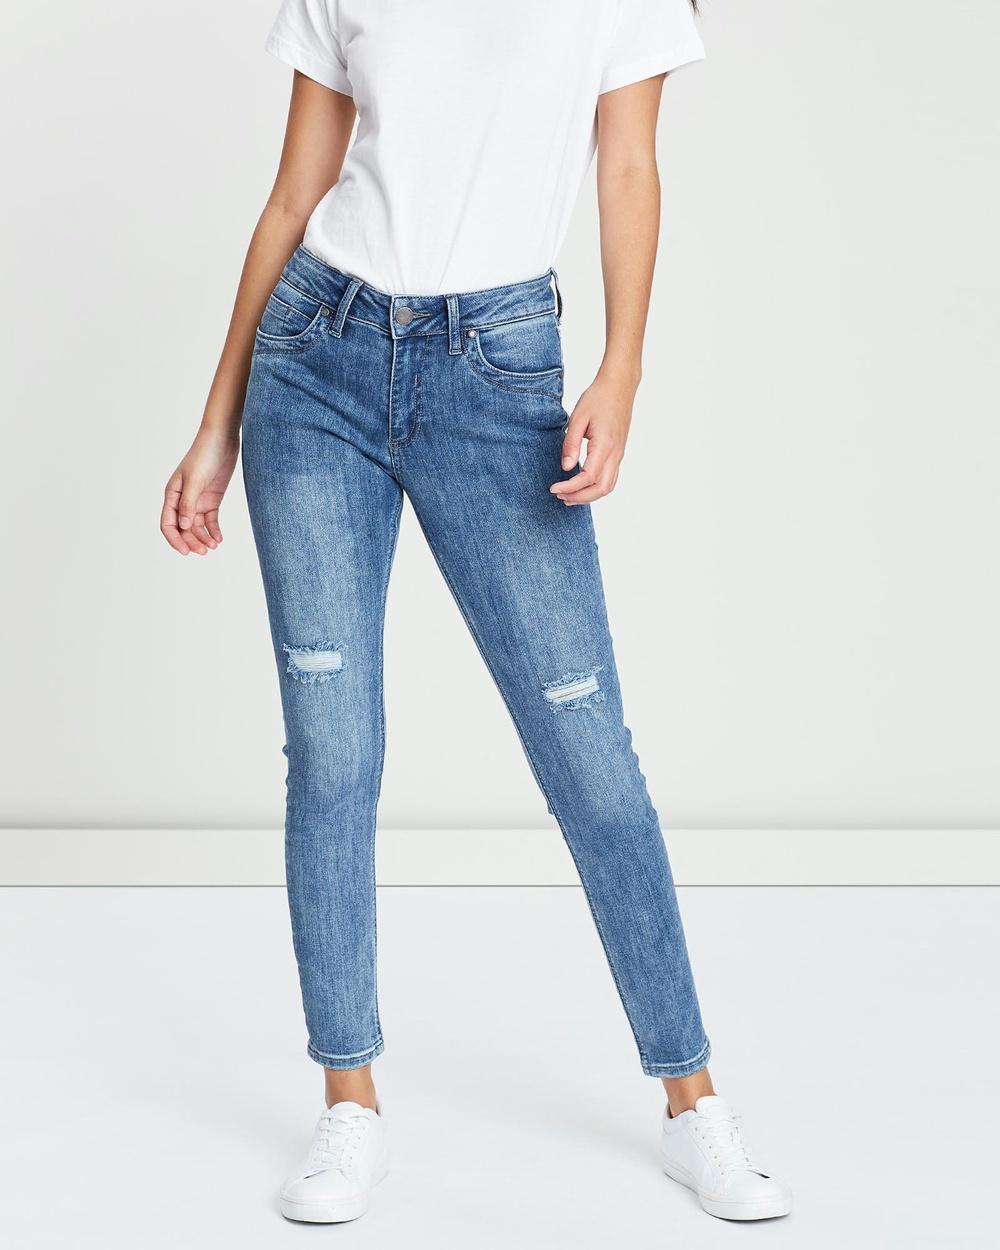 DRICOPER DENIM Lauren Denim Jeans Mid Wash Australia